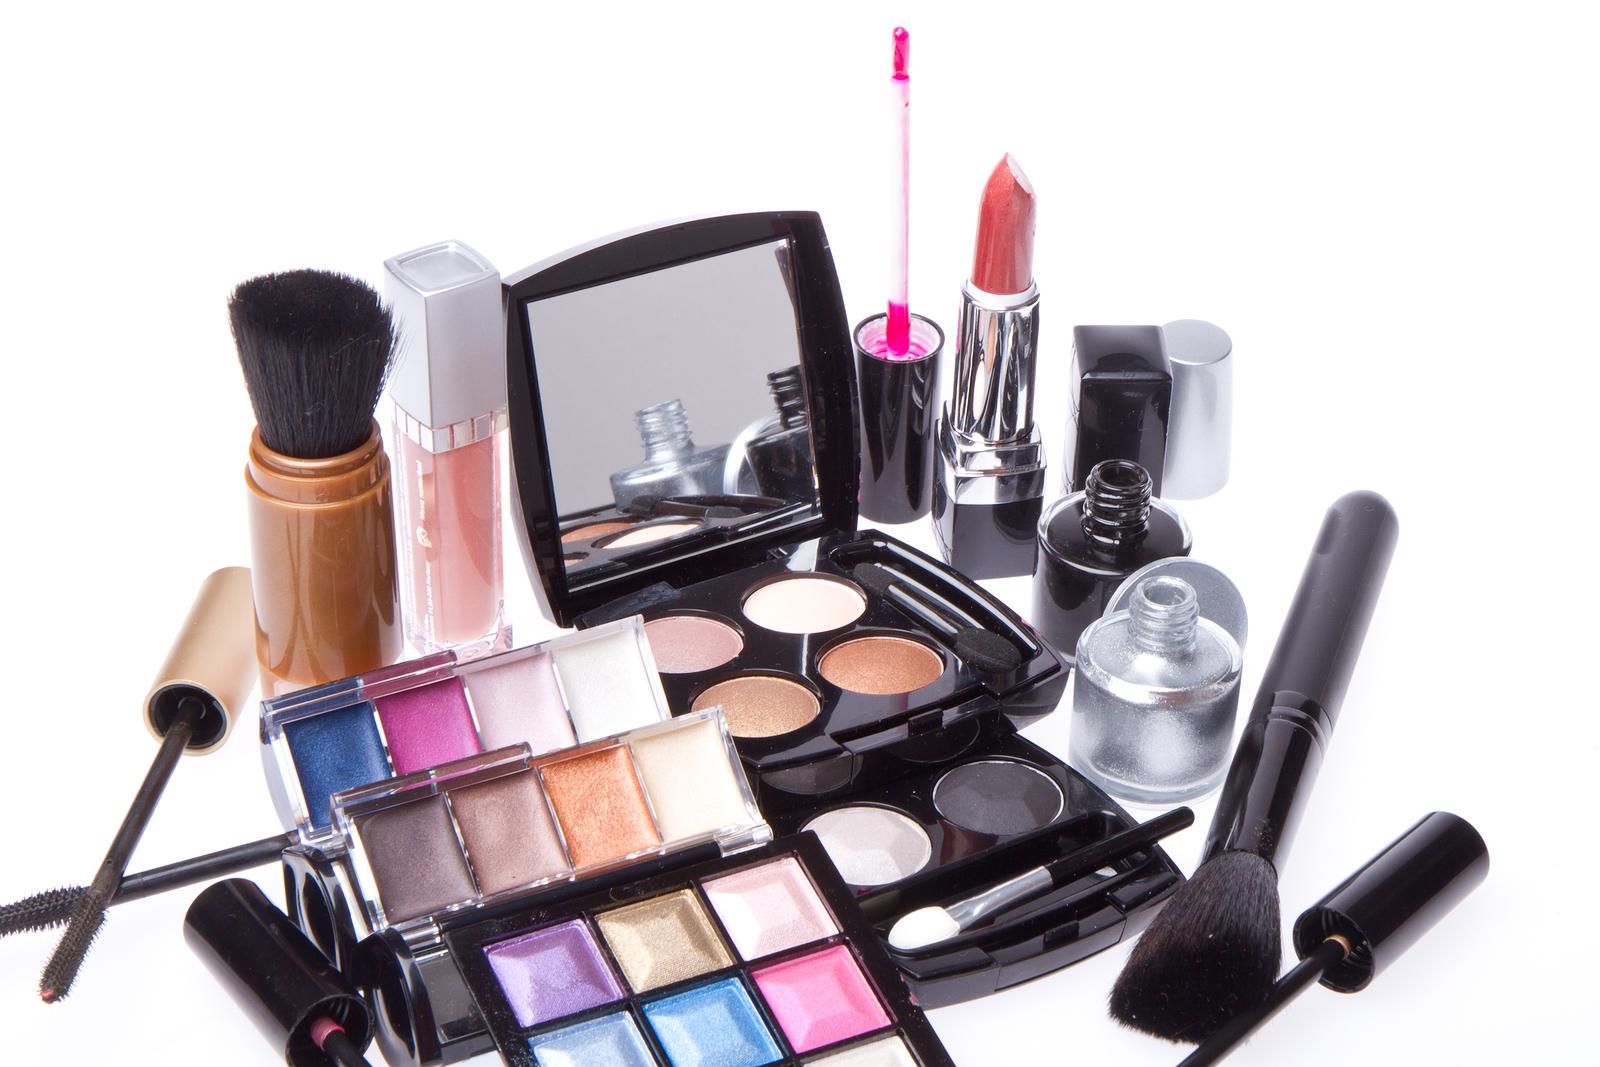 bigstock-makeup-set-isolated-on-white-b-45788116.jpg